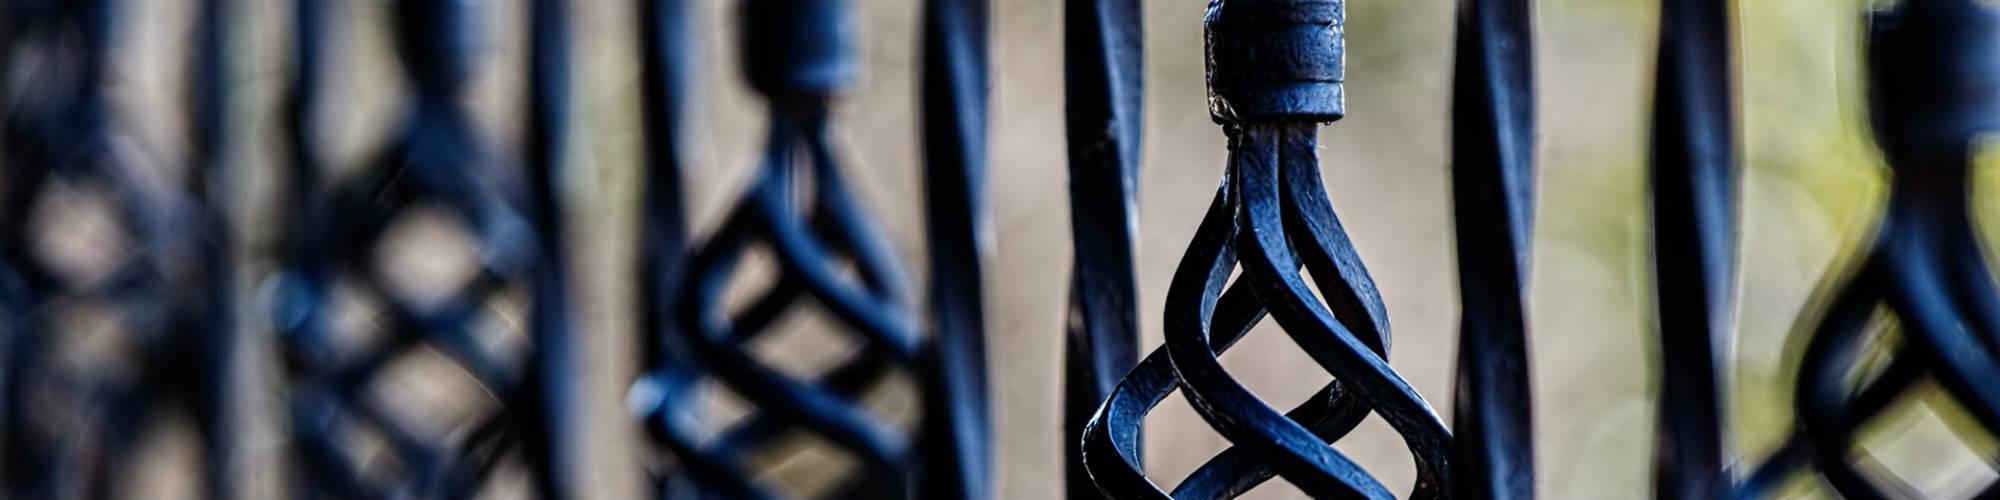 decorative iron fencing closeup